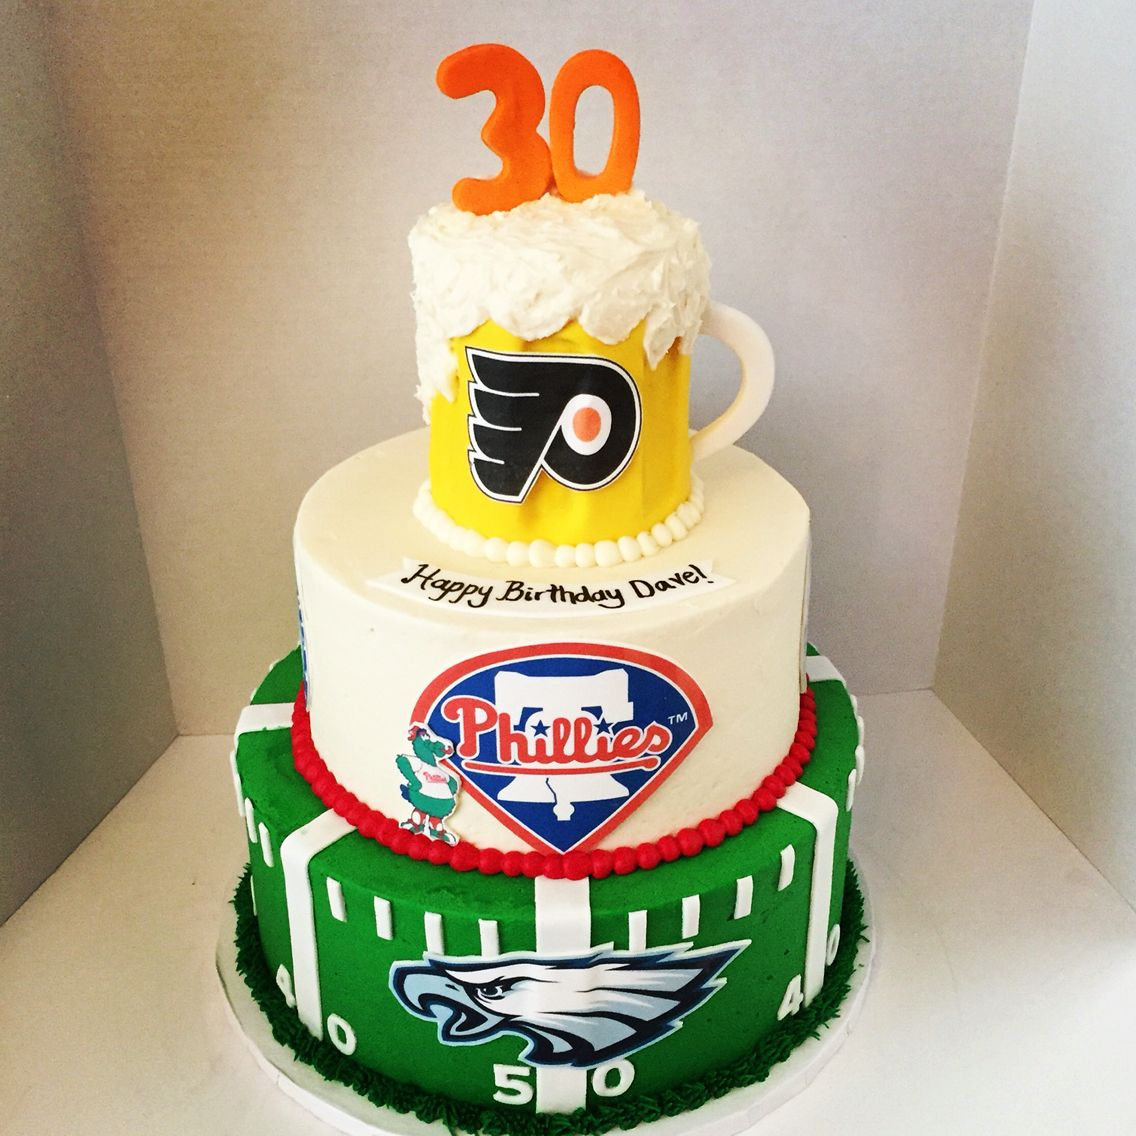 Amazing Philly Sports Cake Philadelphia Sports Cake 30Th Birthday Cake Funny Birthday Cards Online Hendilapandamsfinfo